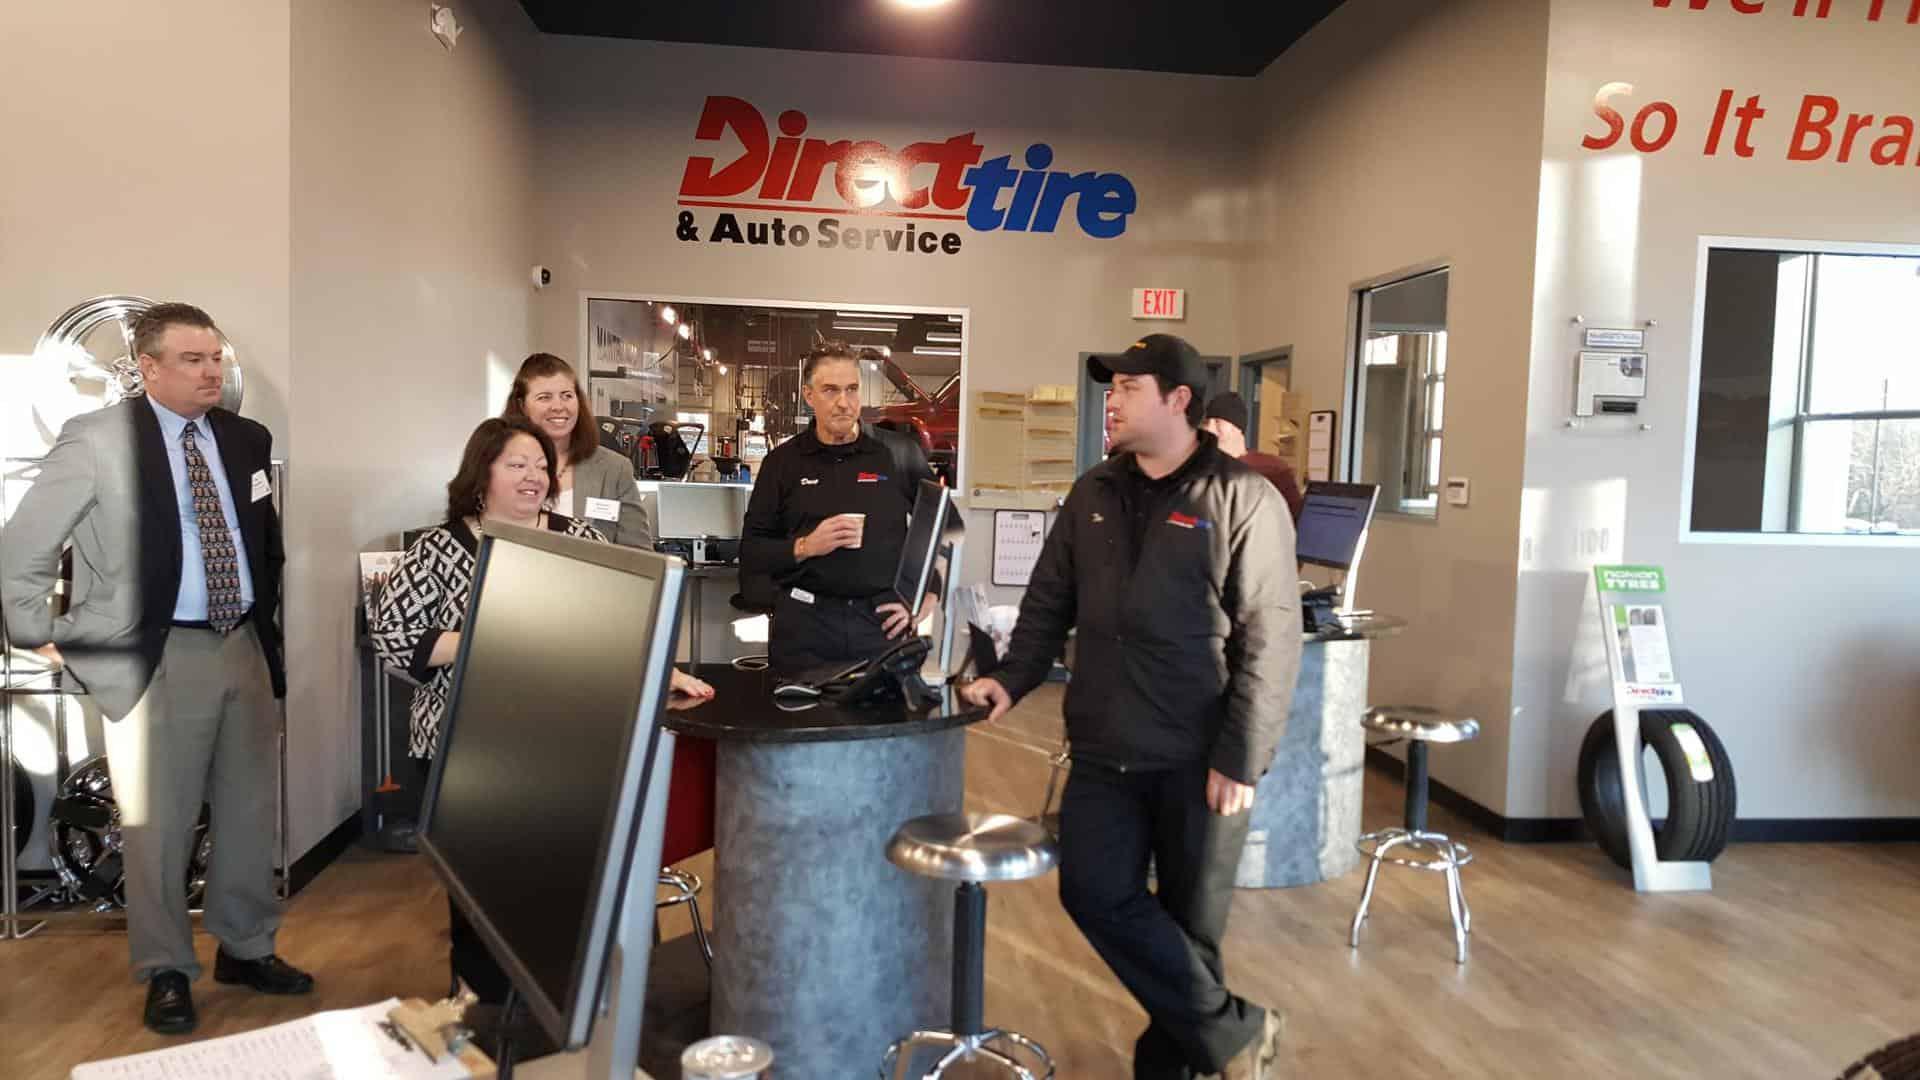 Tim Haynes of Direct Tire